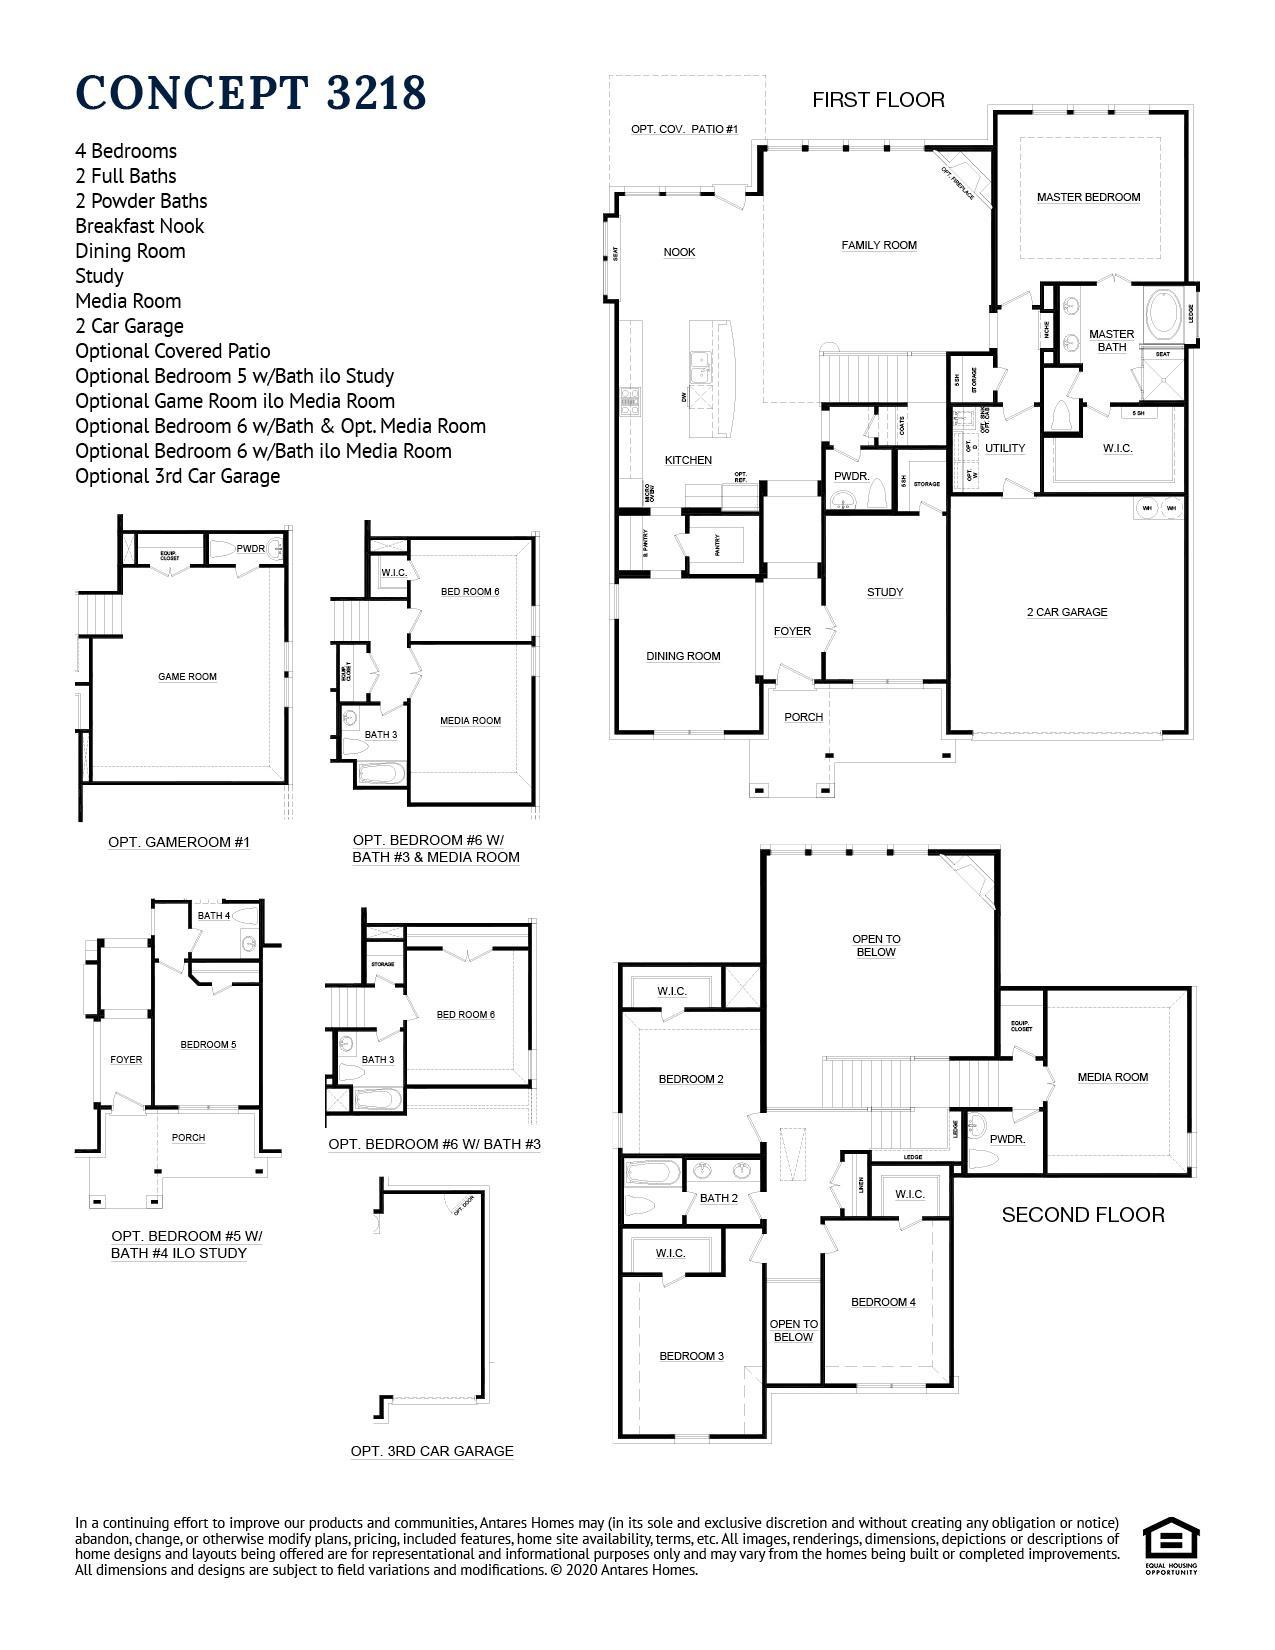 Concept 3218 Floorplan